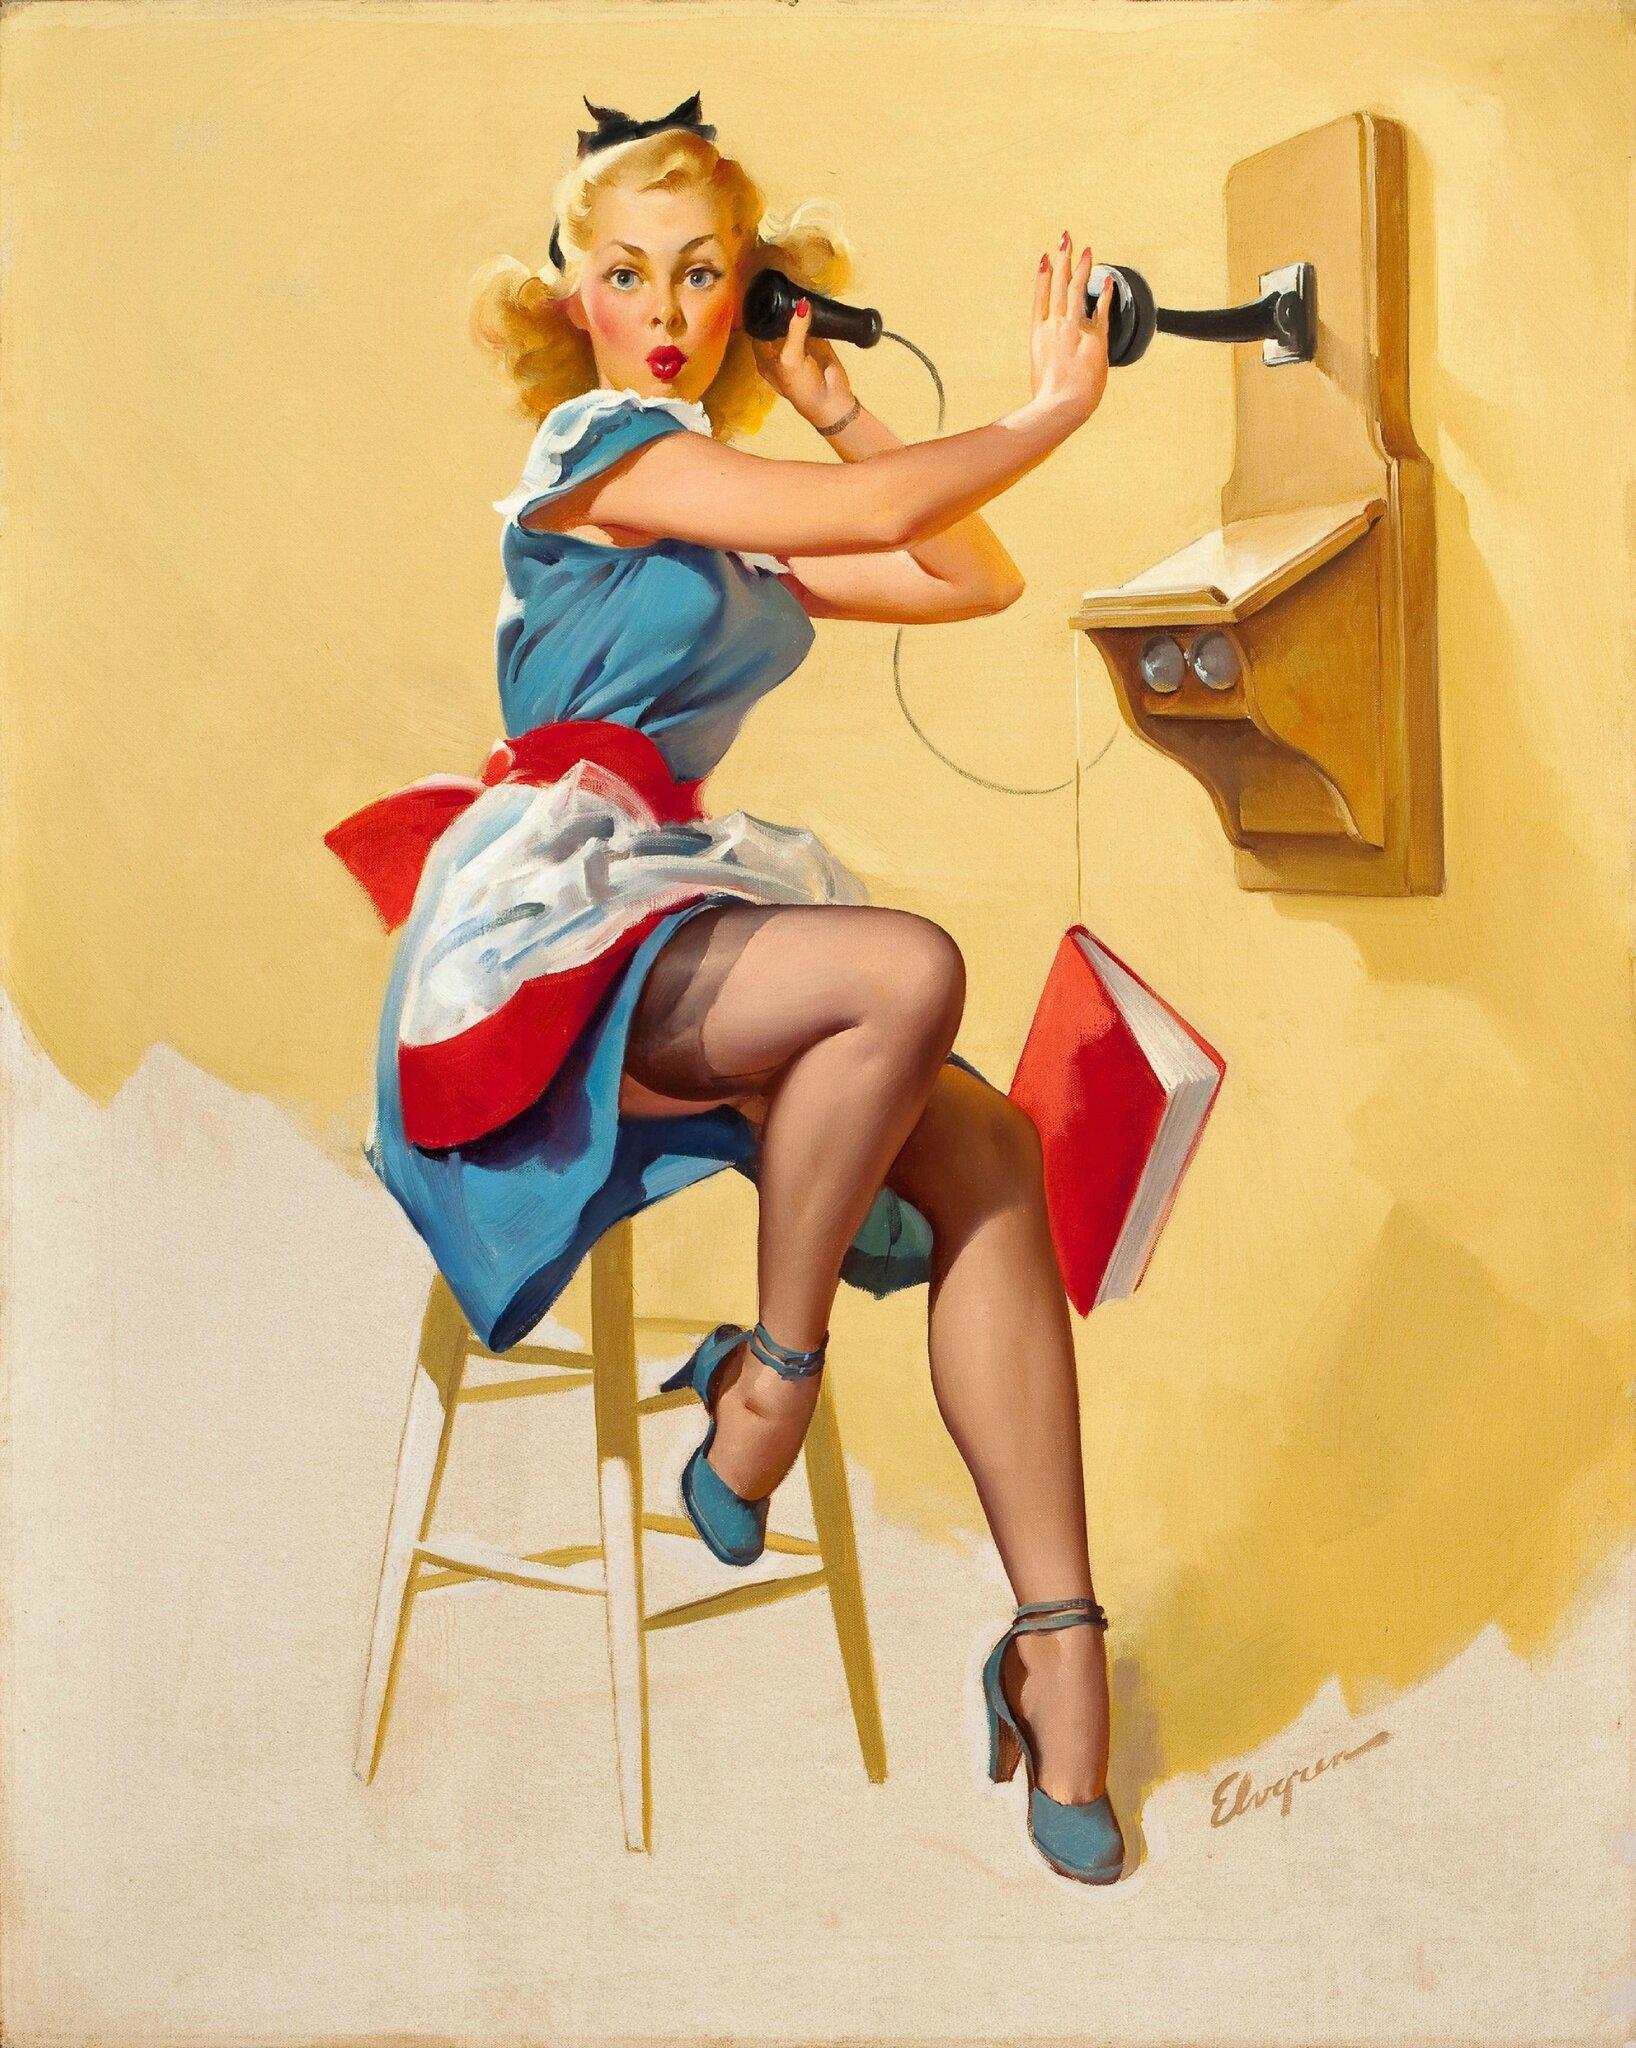 Pin-Up-Girls-Art-Paintings-28